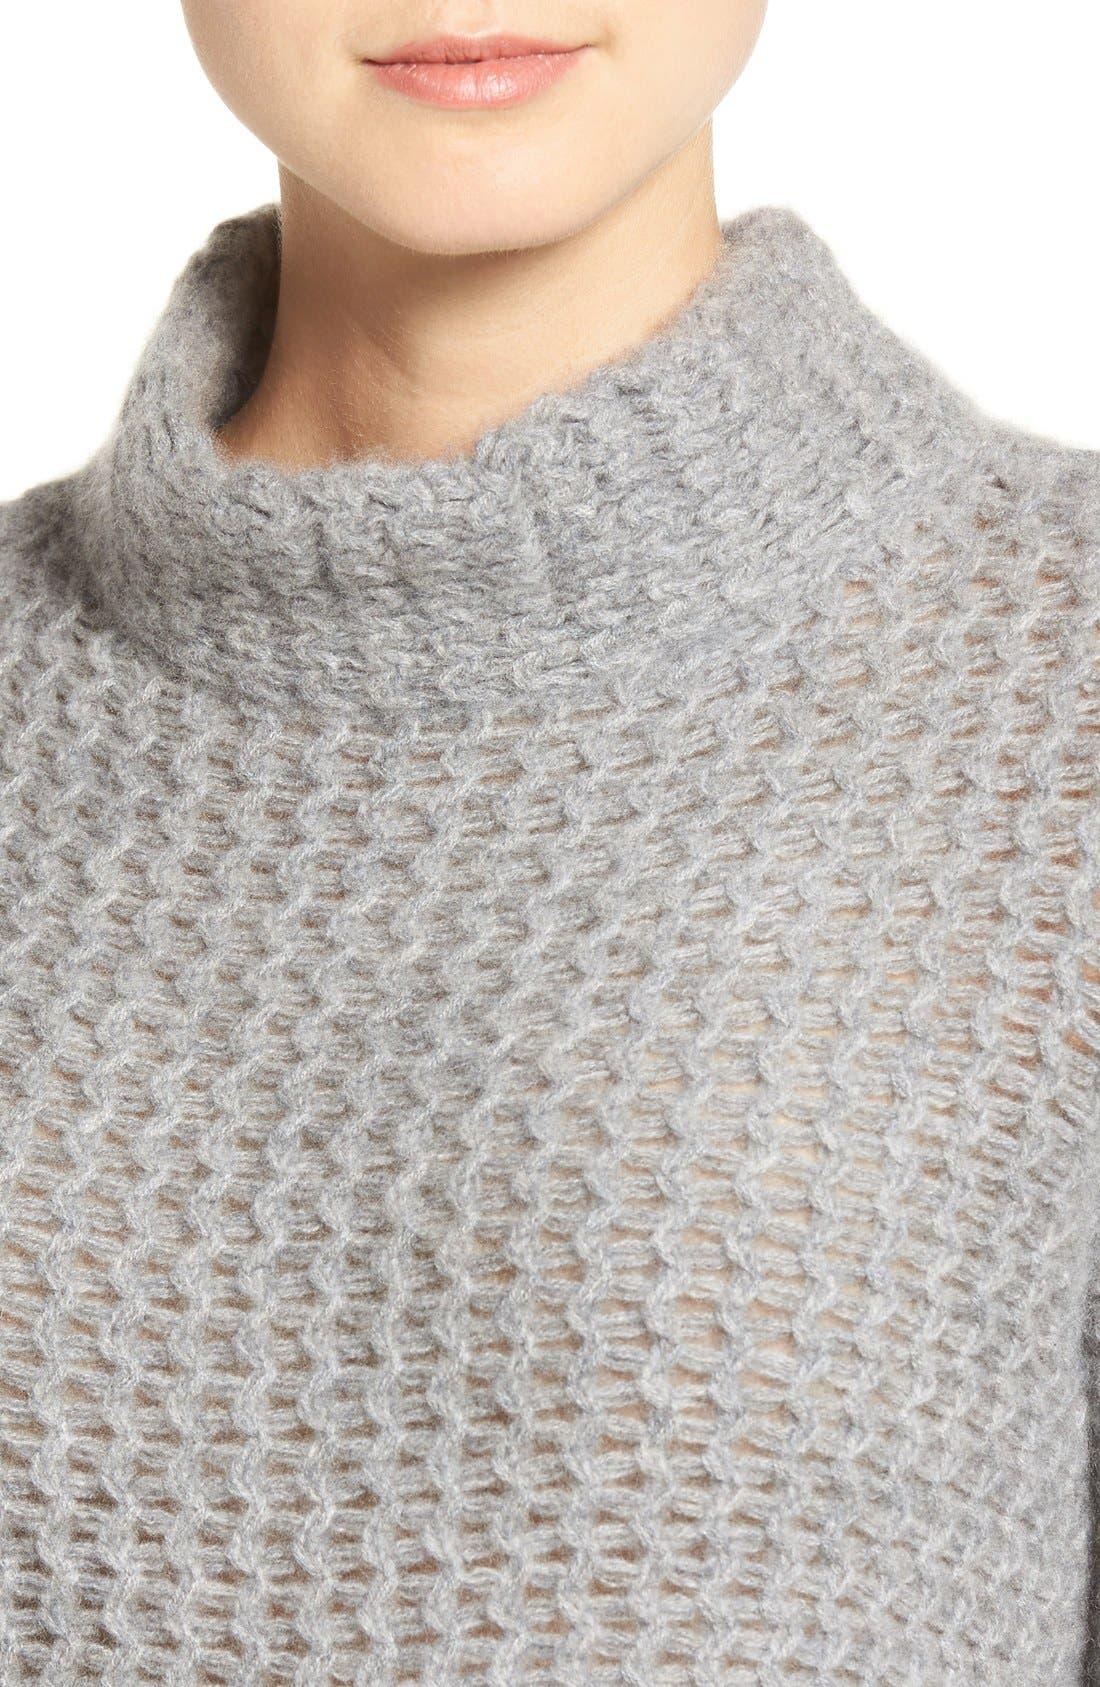 Stitch Detail Cashmere Mock Neck Sweater,                             Alternate thumbnail 5, color,                             030